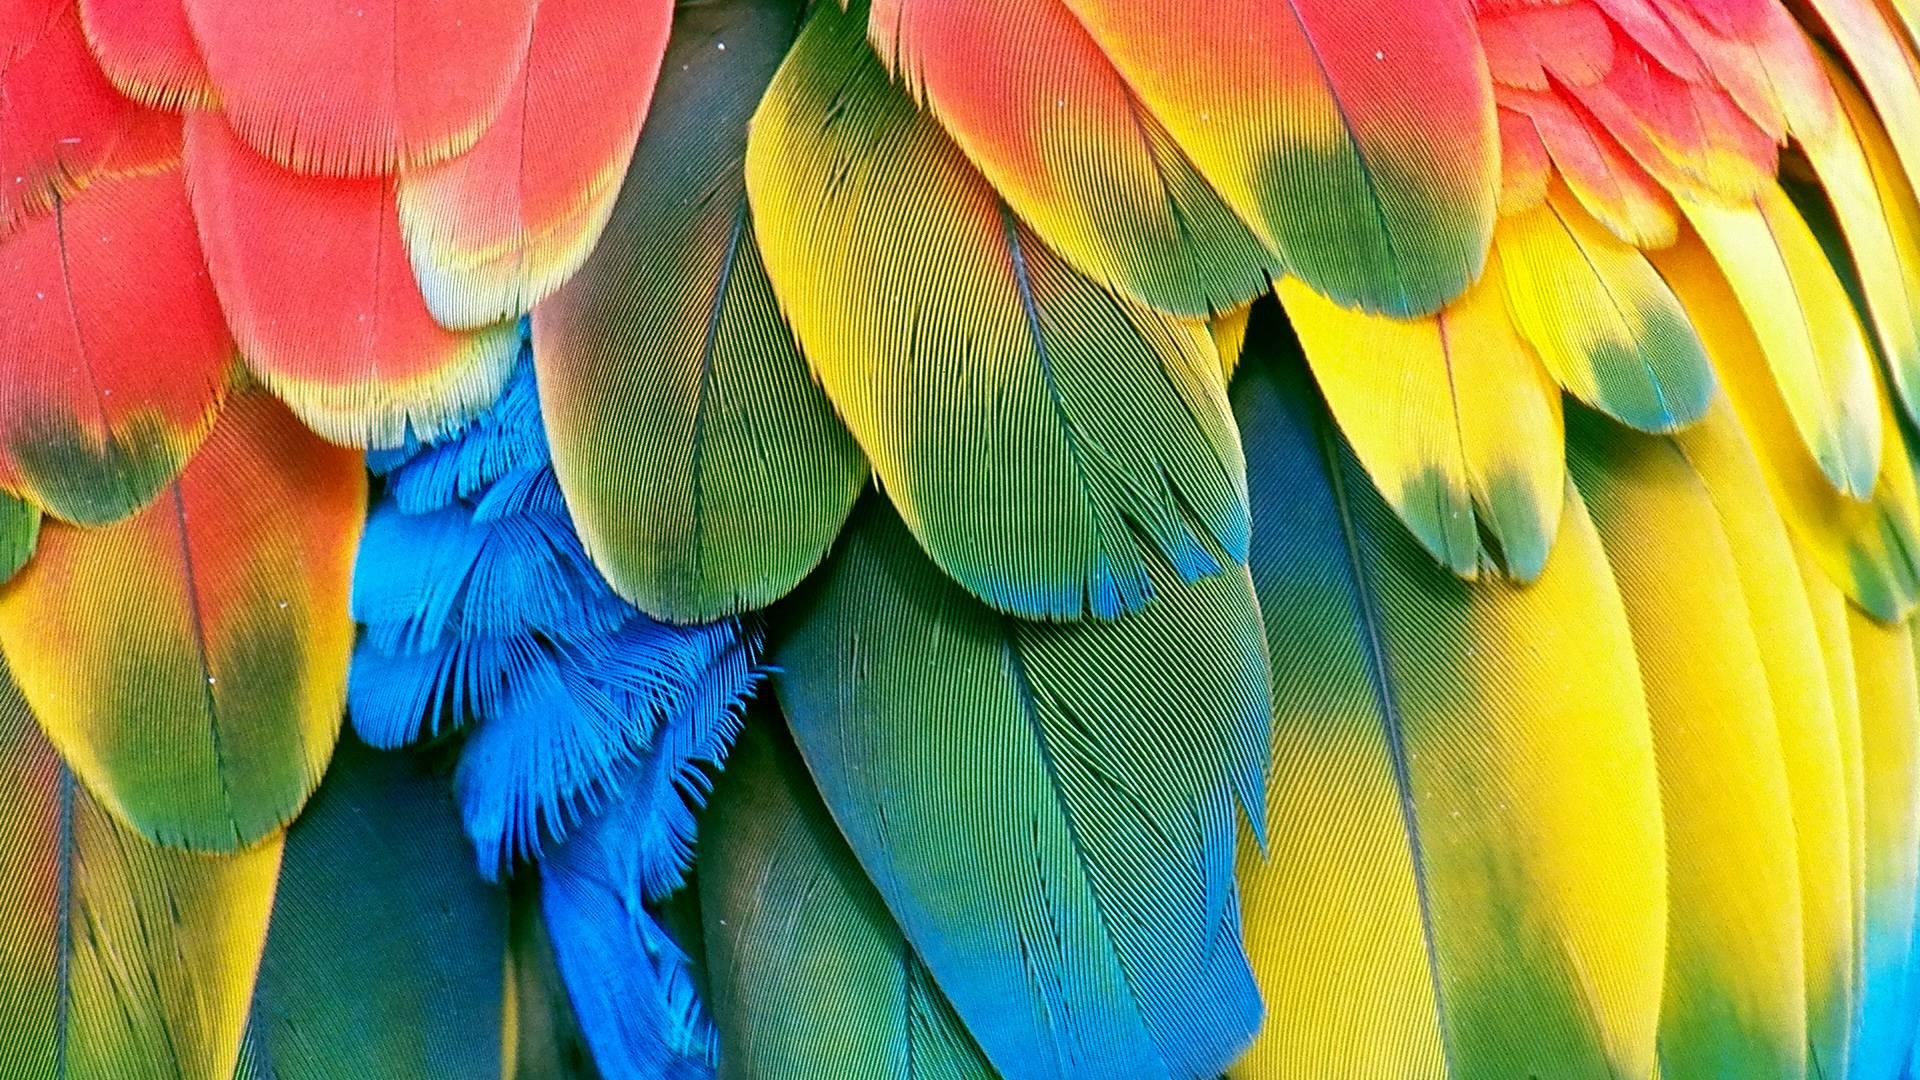 tropical bird wallpaper for walls - photo #27